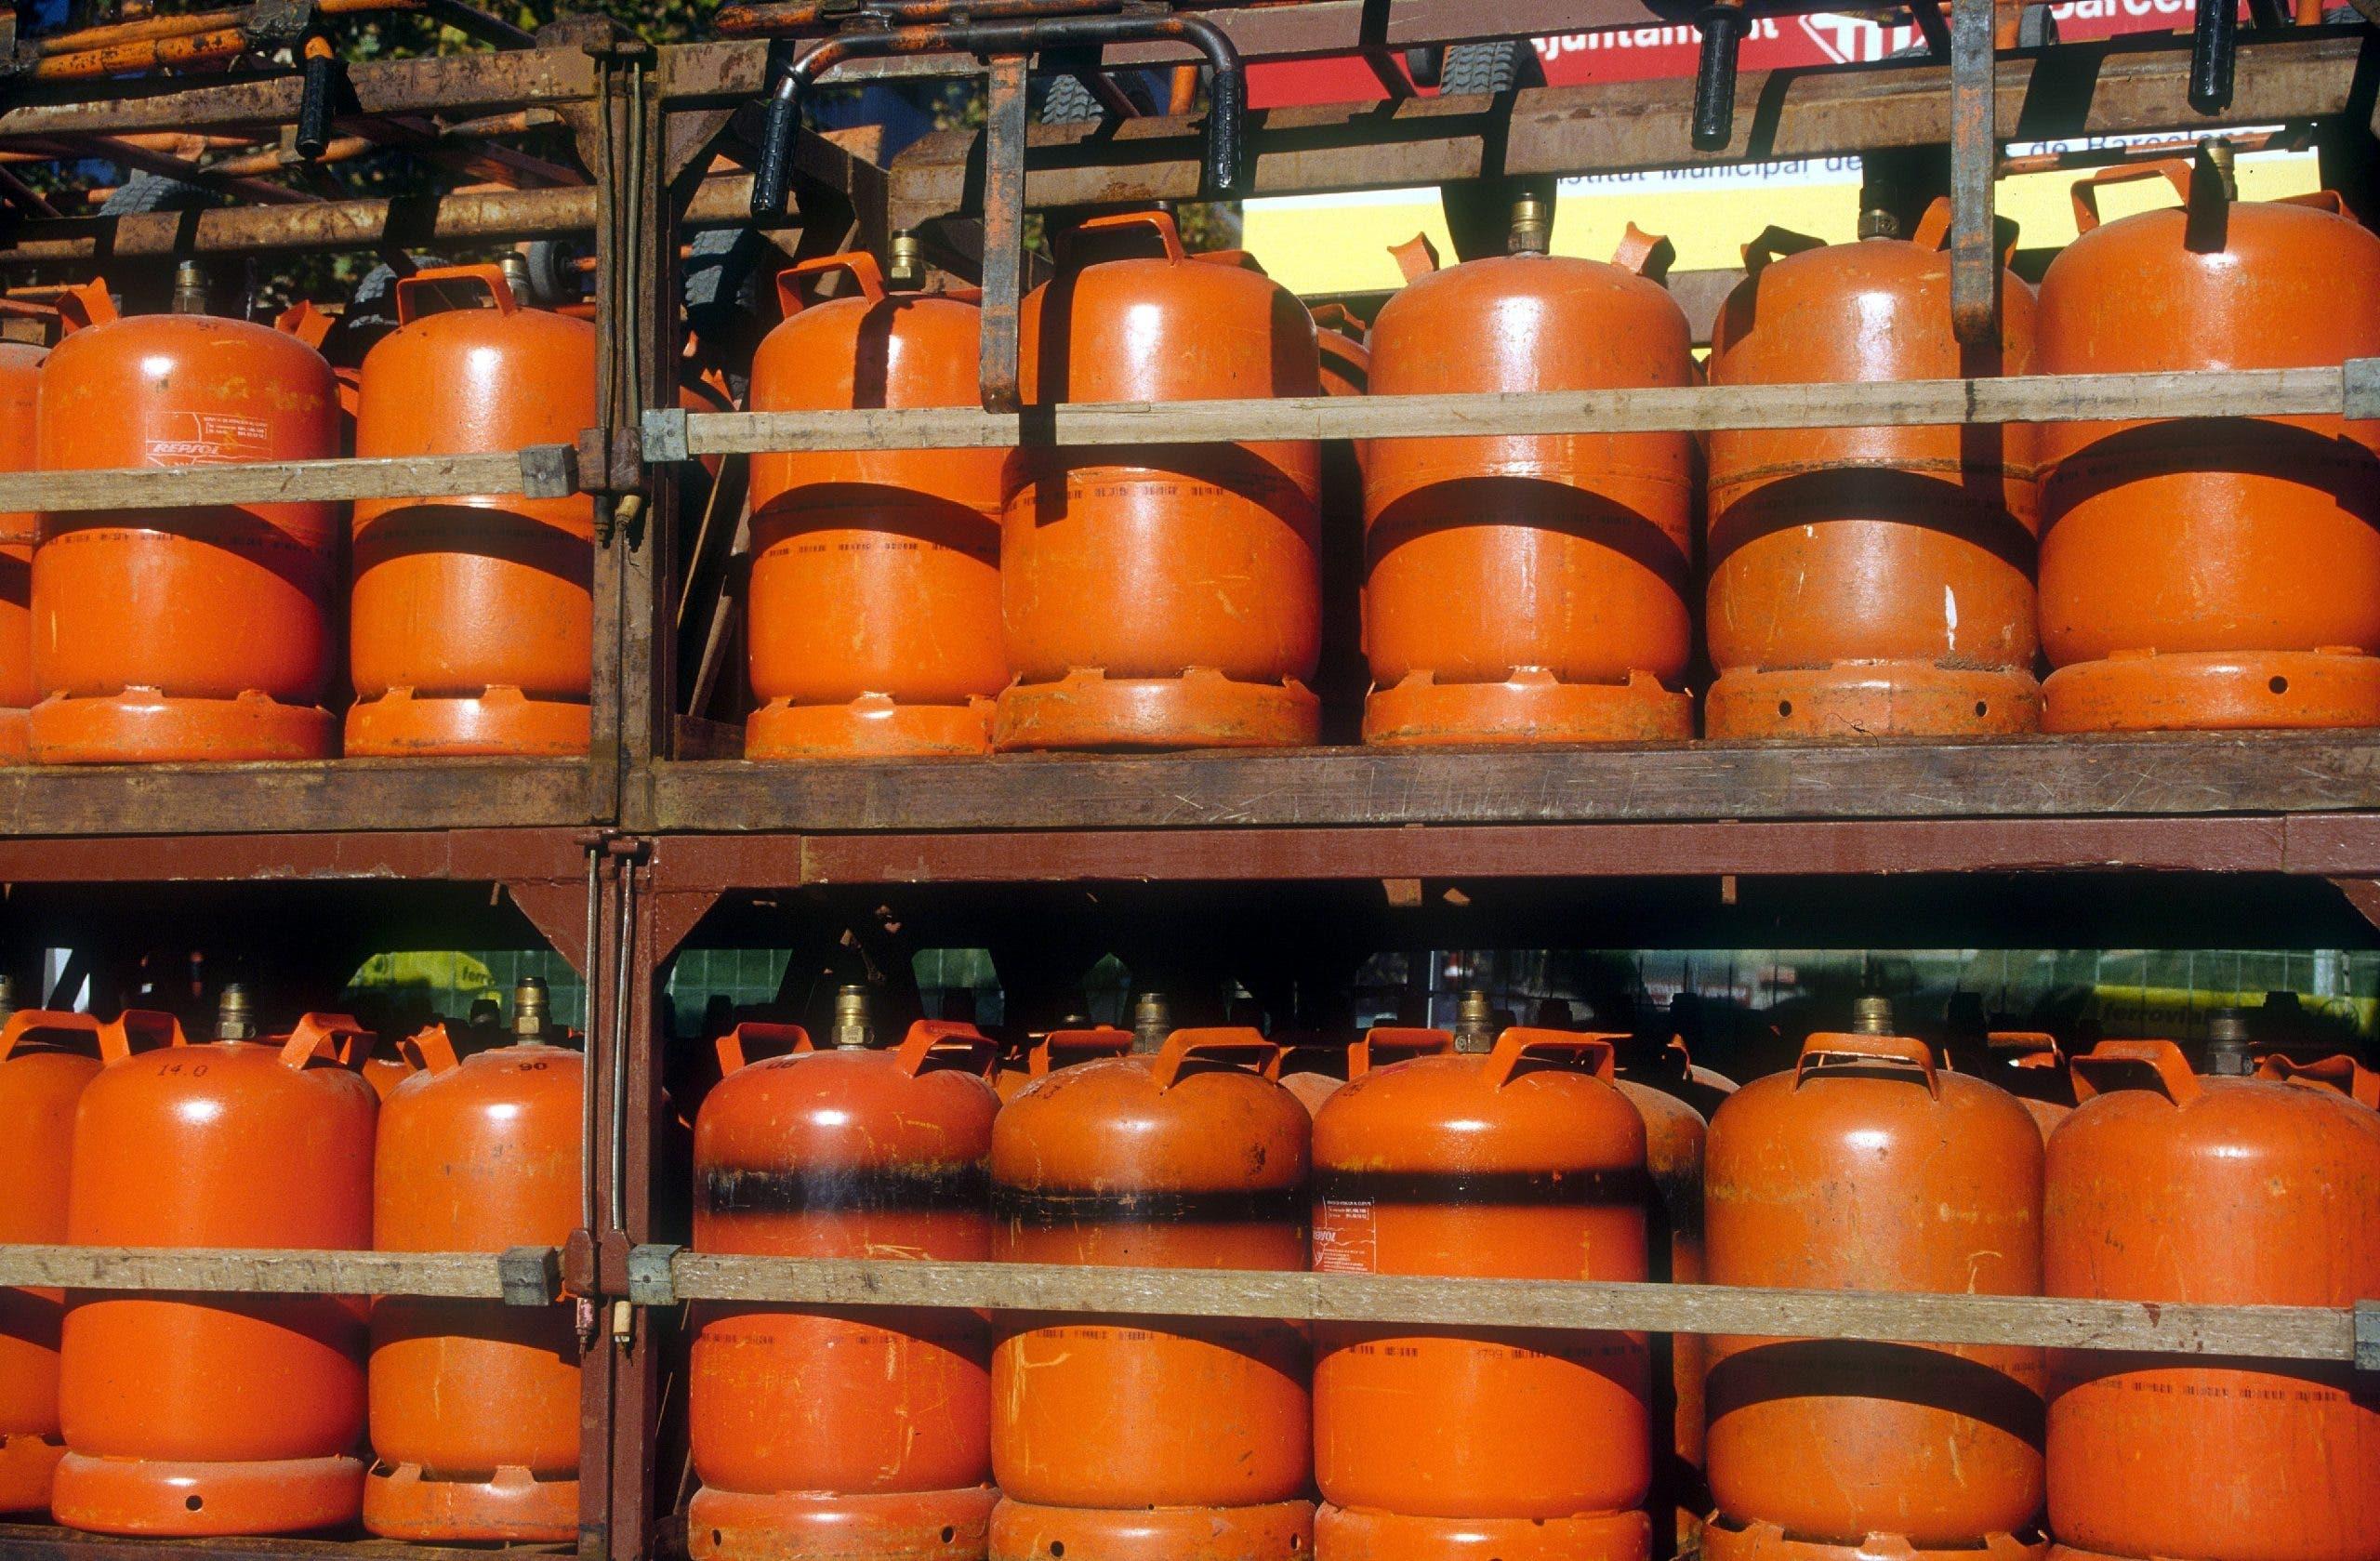 The burglars targeted gas bottles at petrol stations